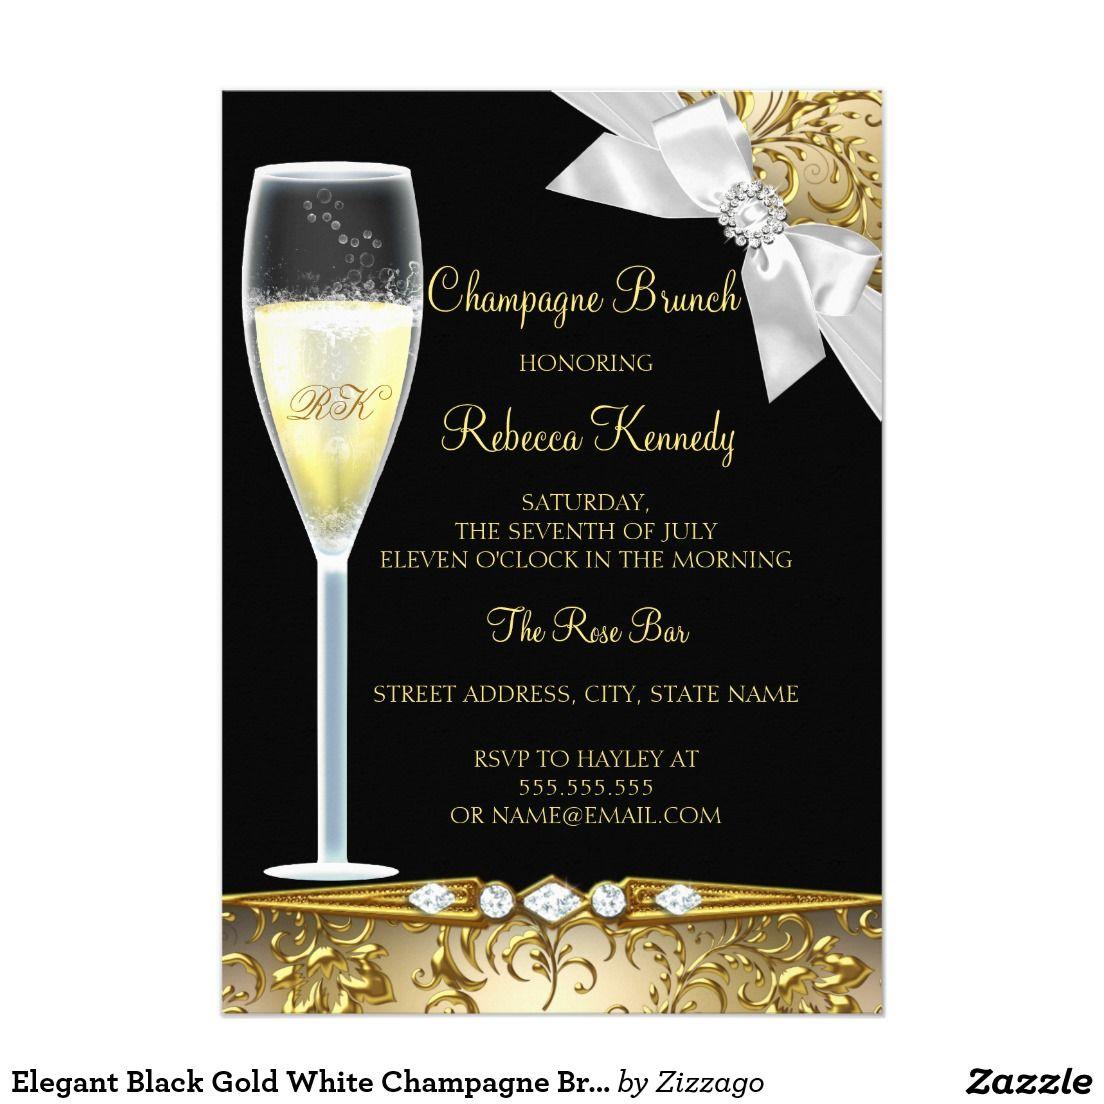 Elegant Black Gold White Champagne Brunch Invite Champagne Brunch